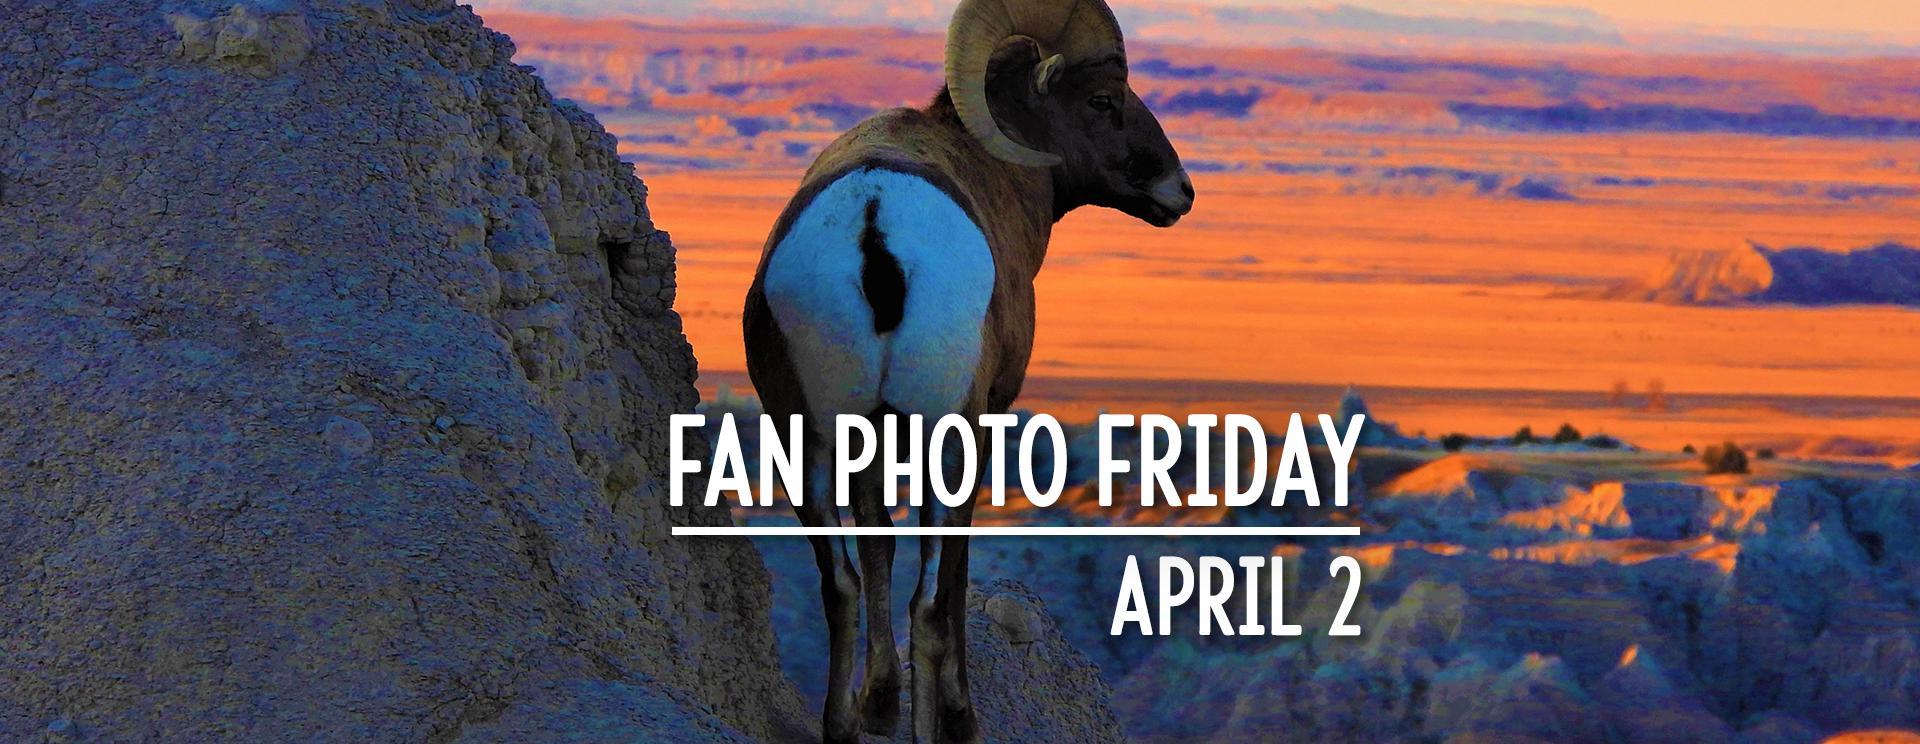 Fan Photo Friday | April 2, 2021